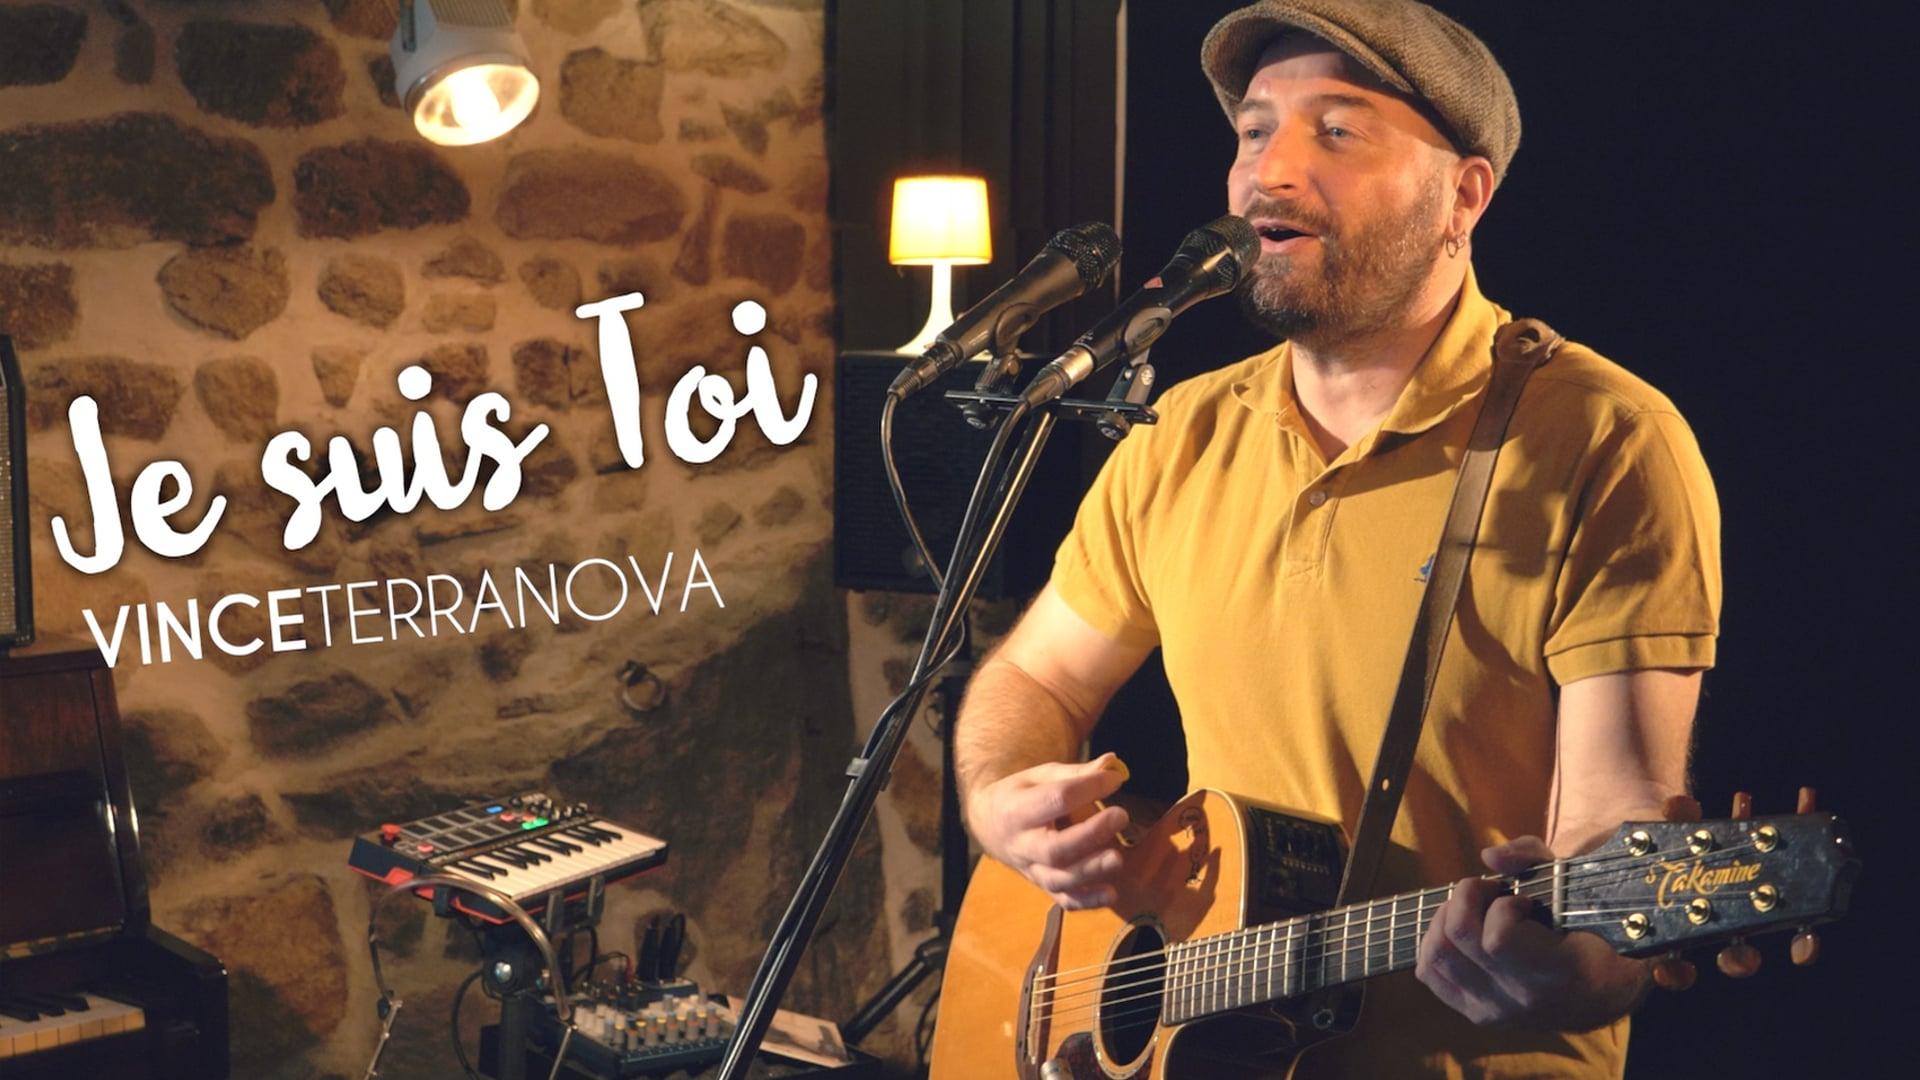 Je Suis Toi - Vince Terranova (clip)